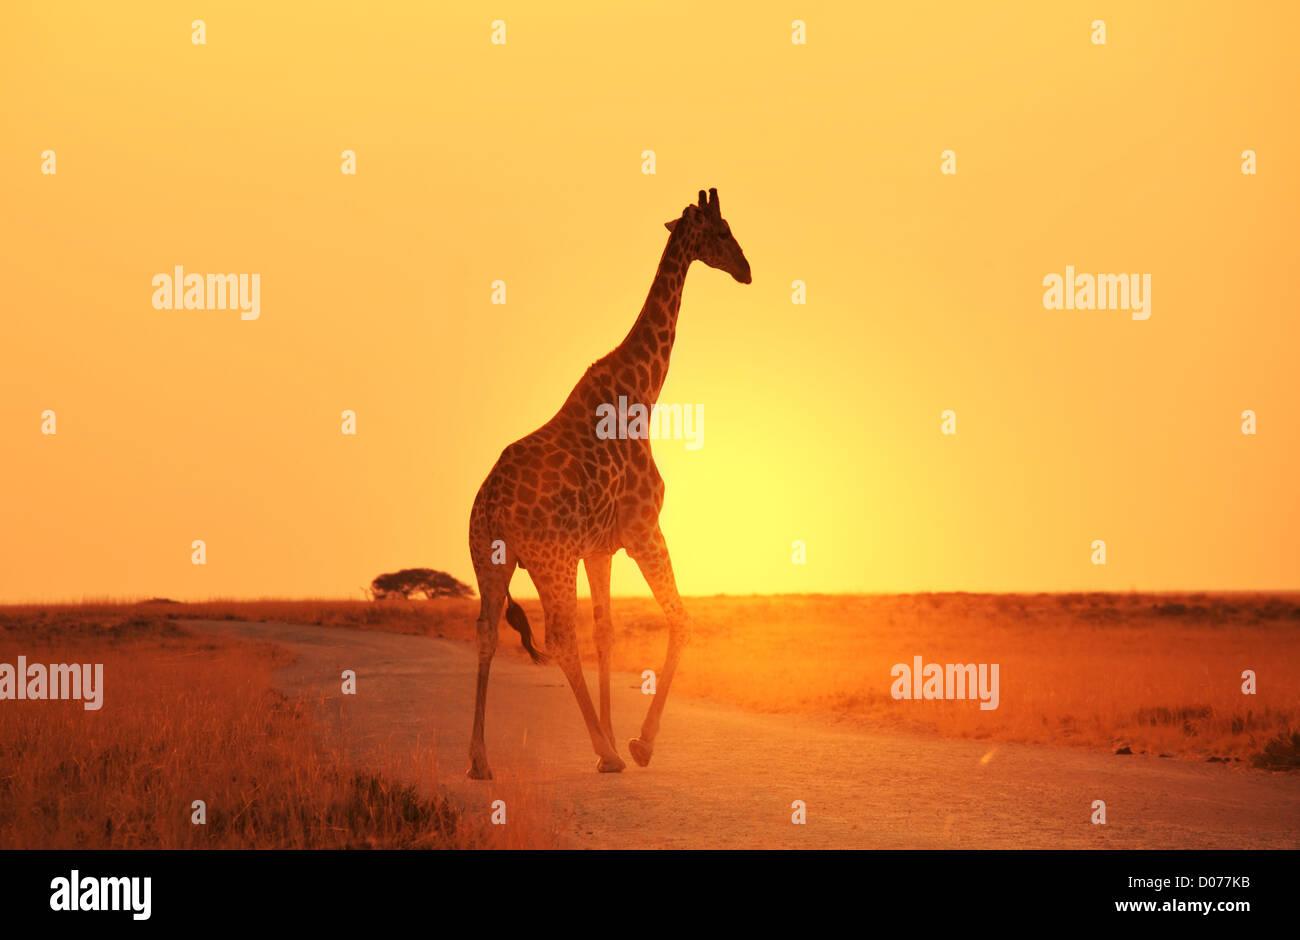 La giraffa a Savannah Immagini Stock